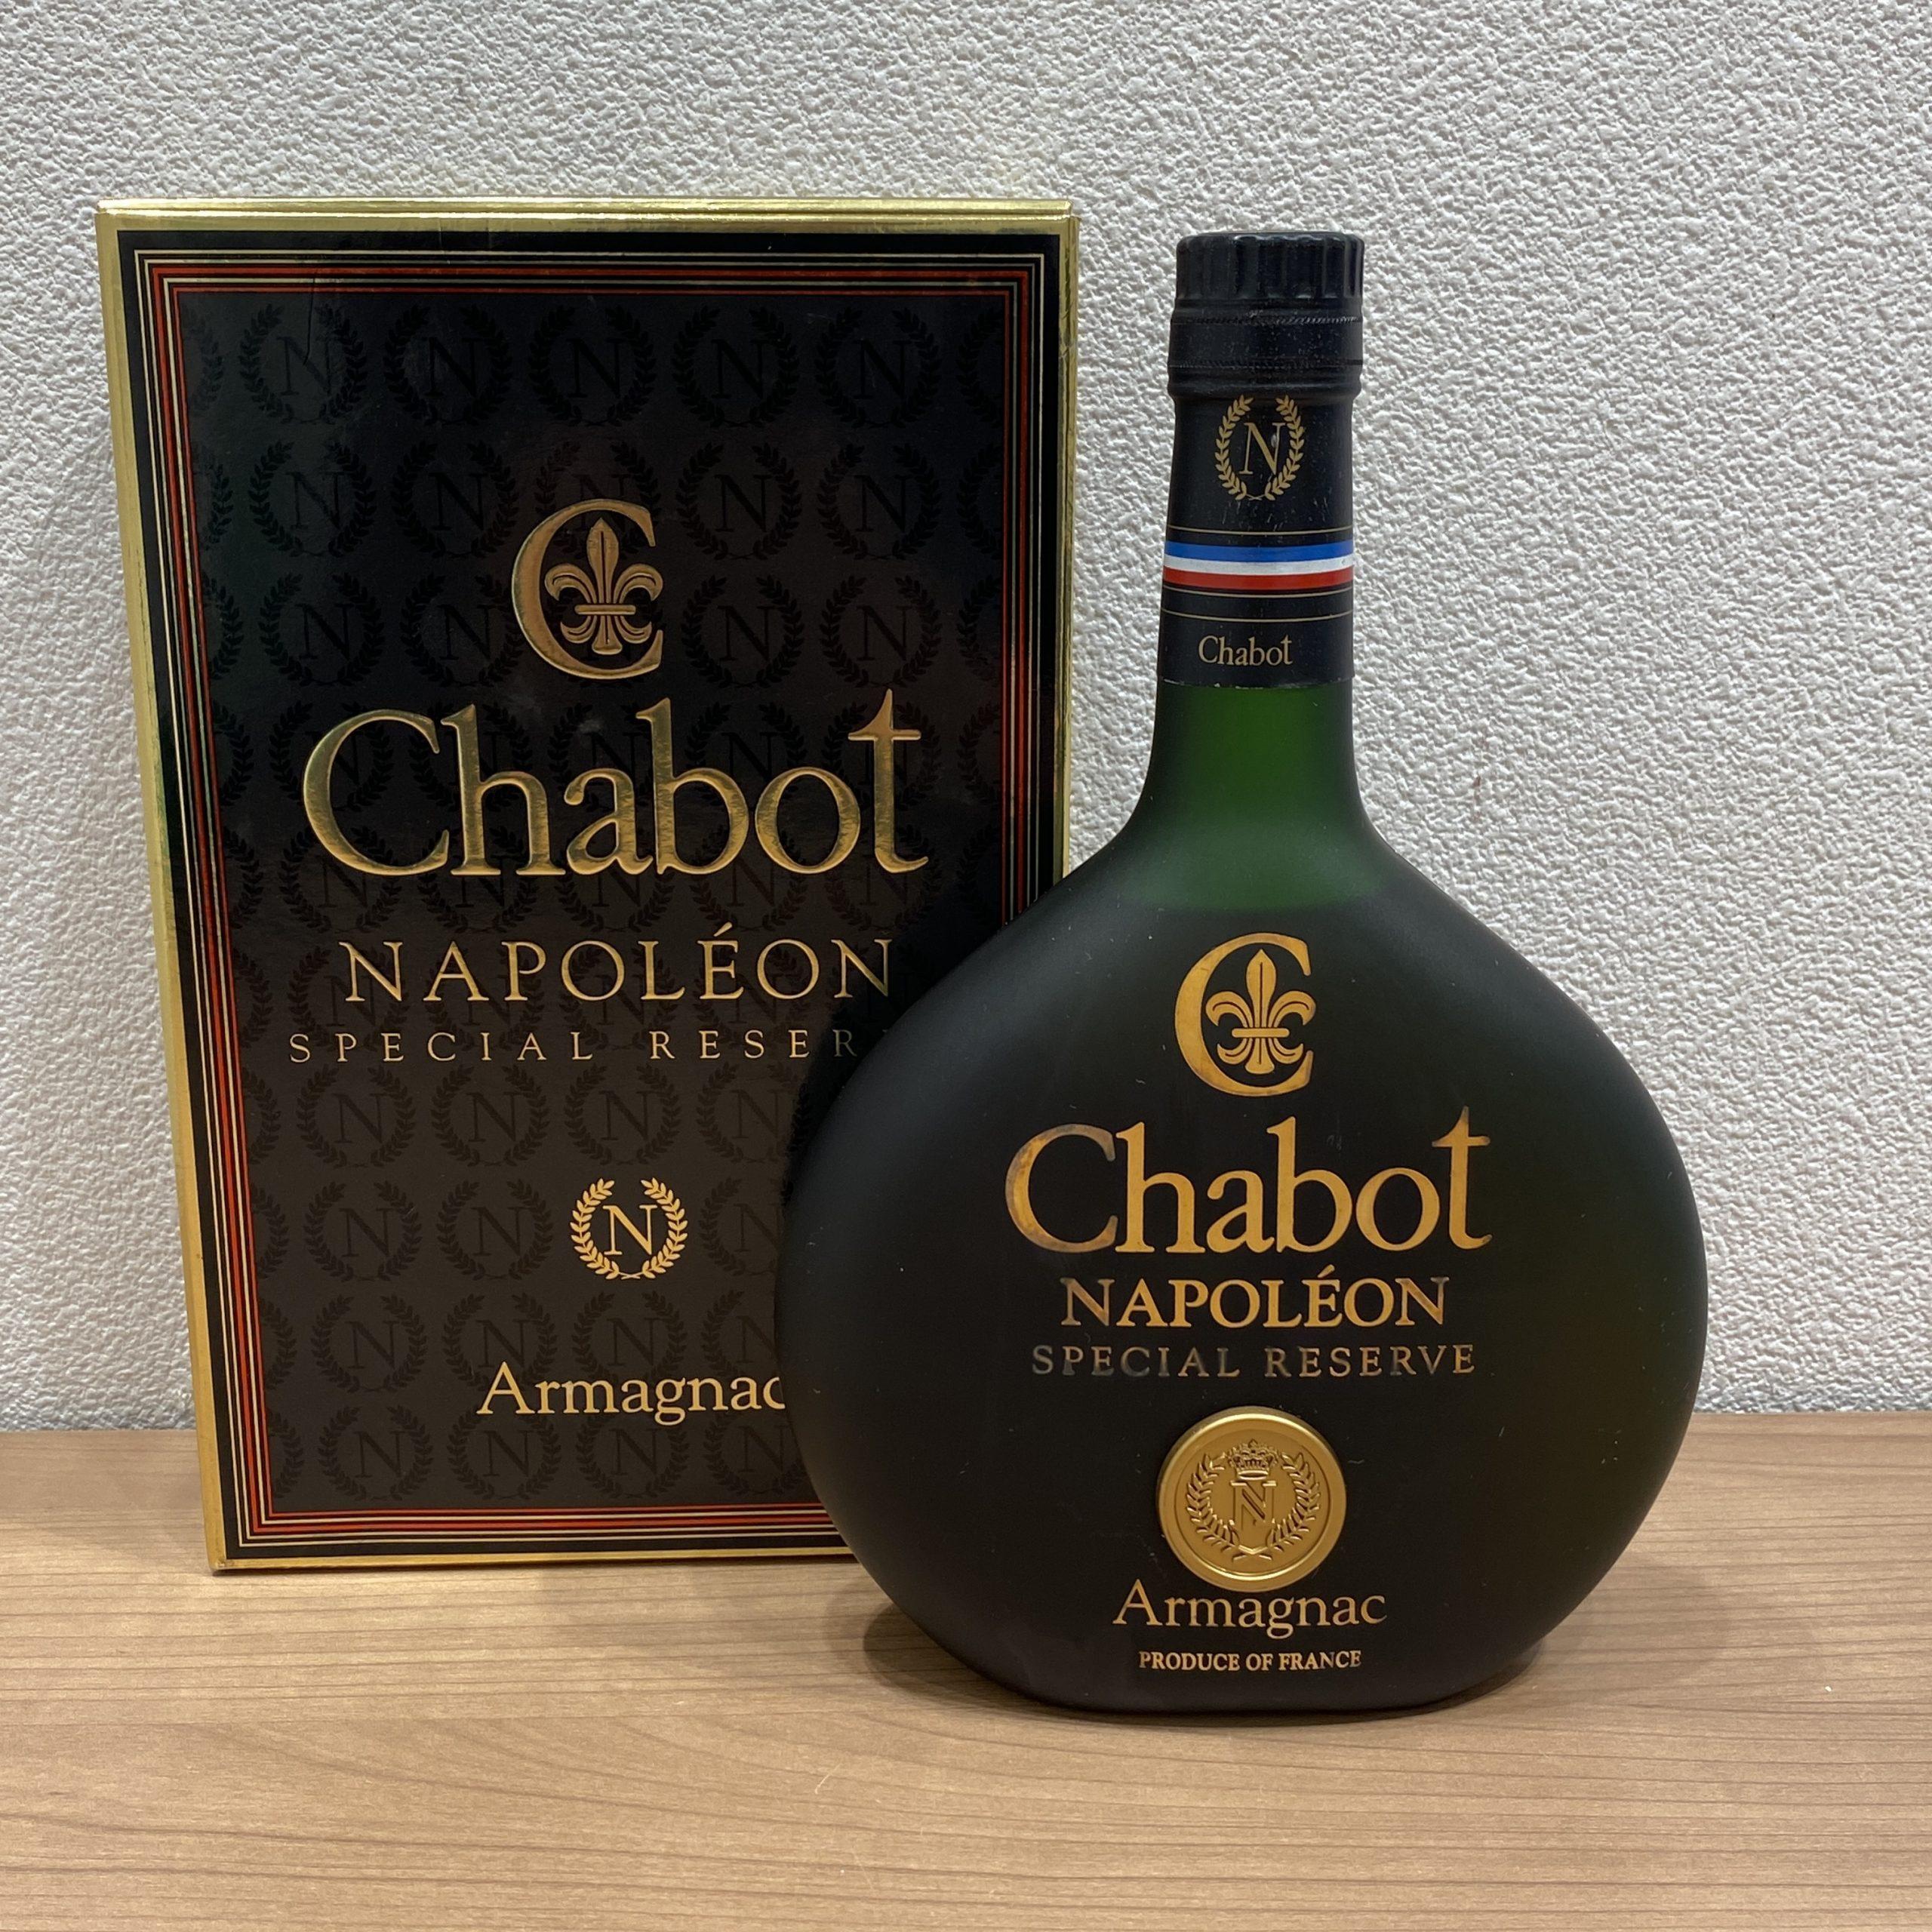 【Chabot/シャボー】NAPOLEON/ナポレオン ブランデー 700ml